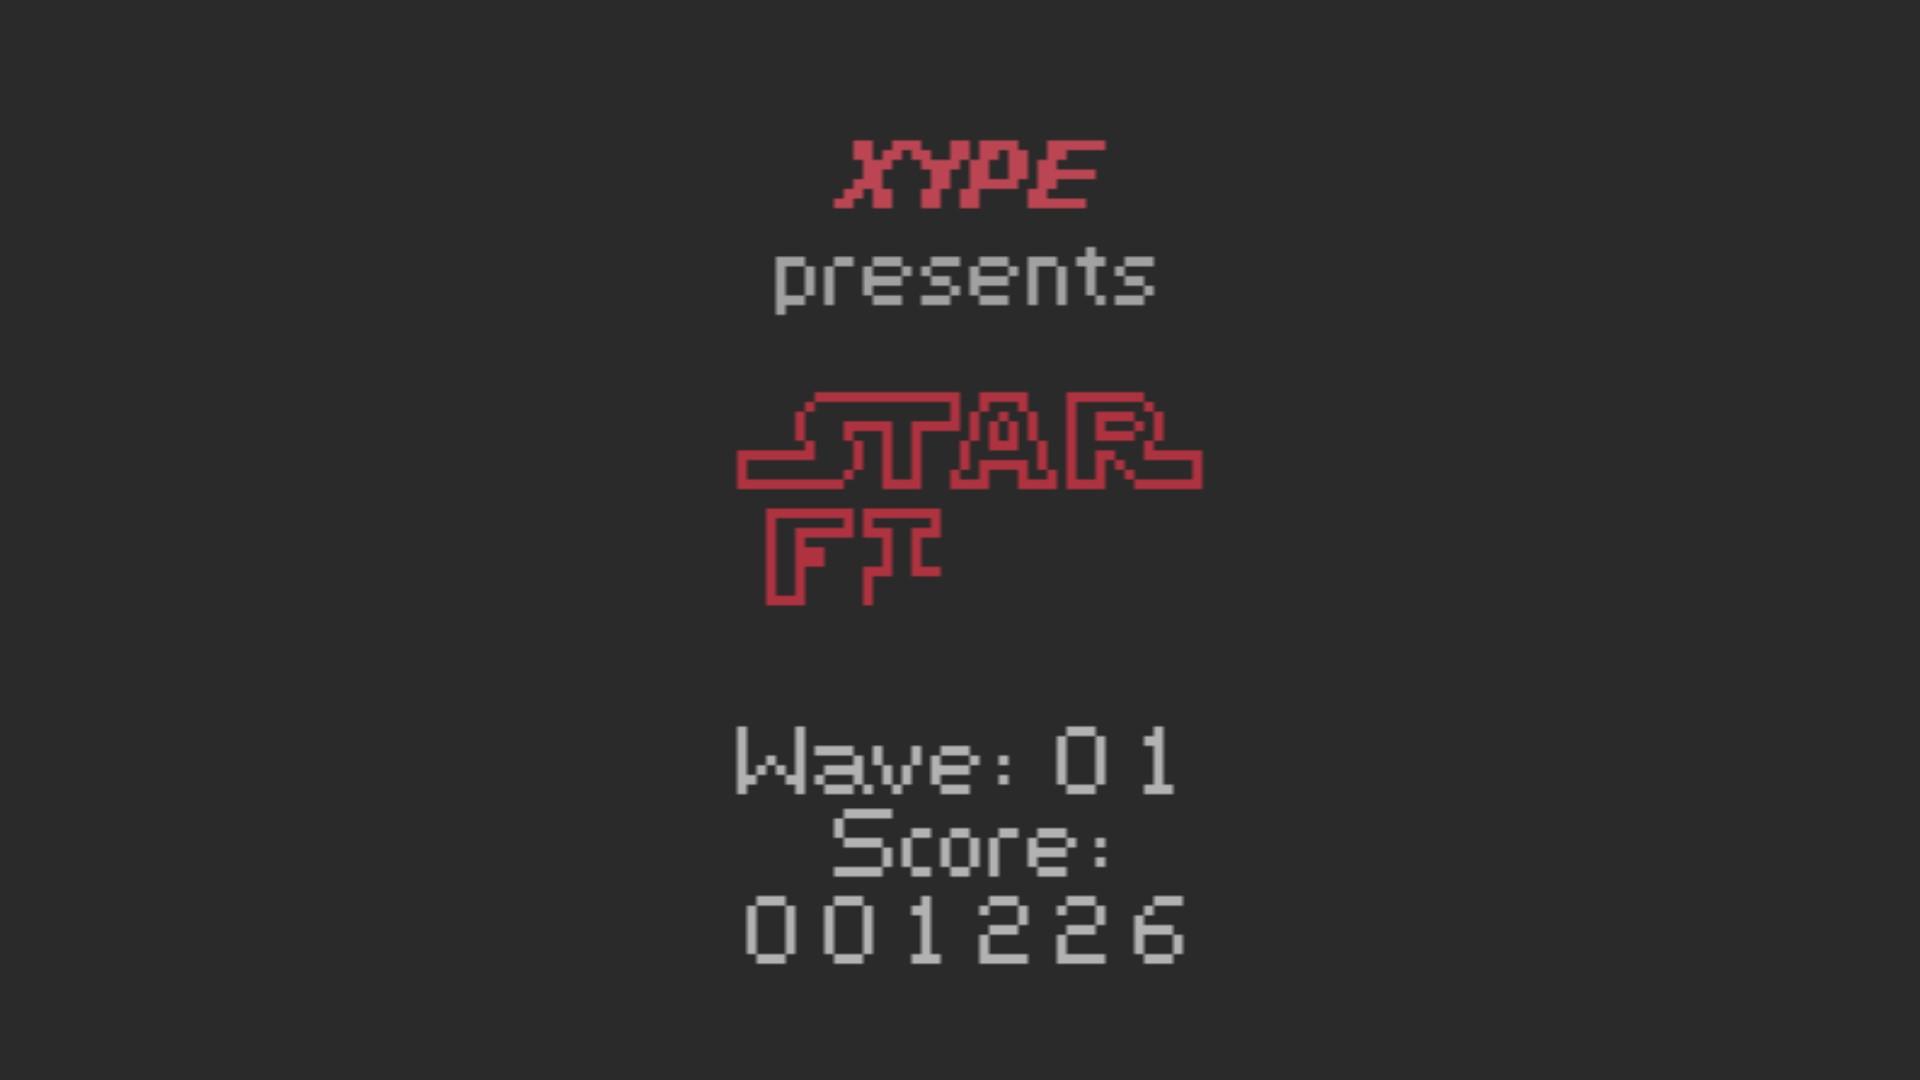 AkinNahtanoj: Star Fire (Atari 2600 Emulated Novice/B Mode) 1,226 points on 2020-10-17 11:28:39